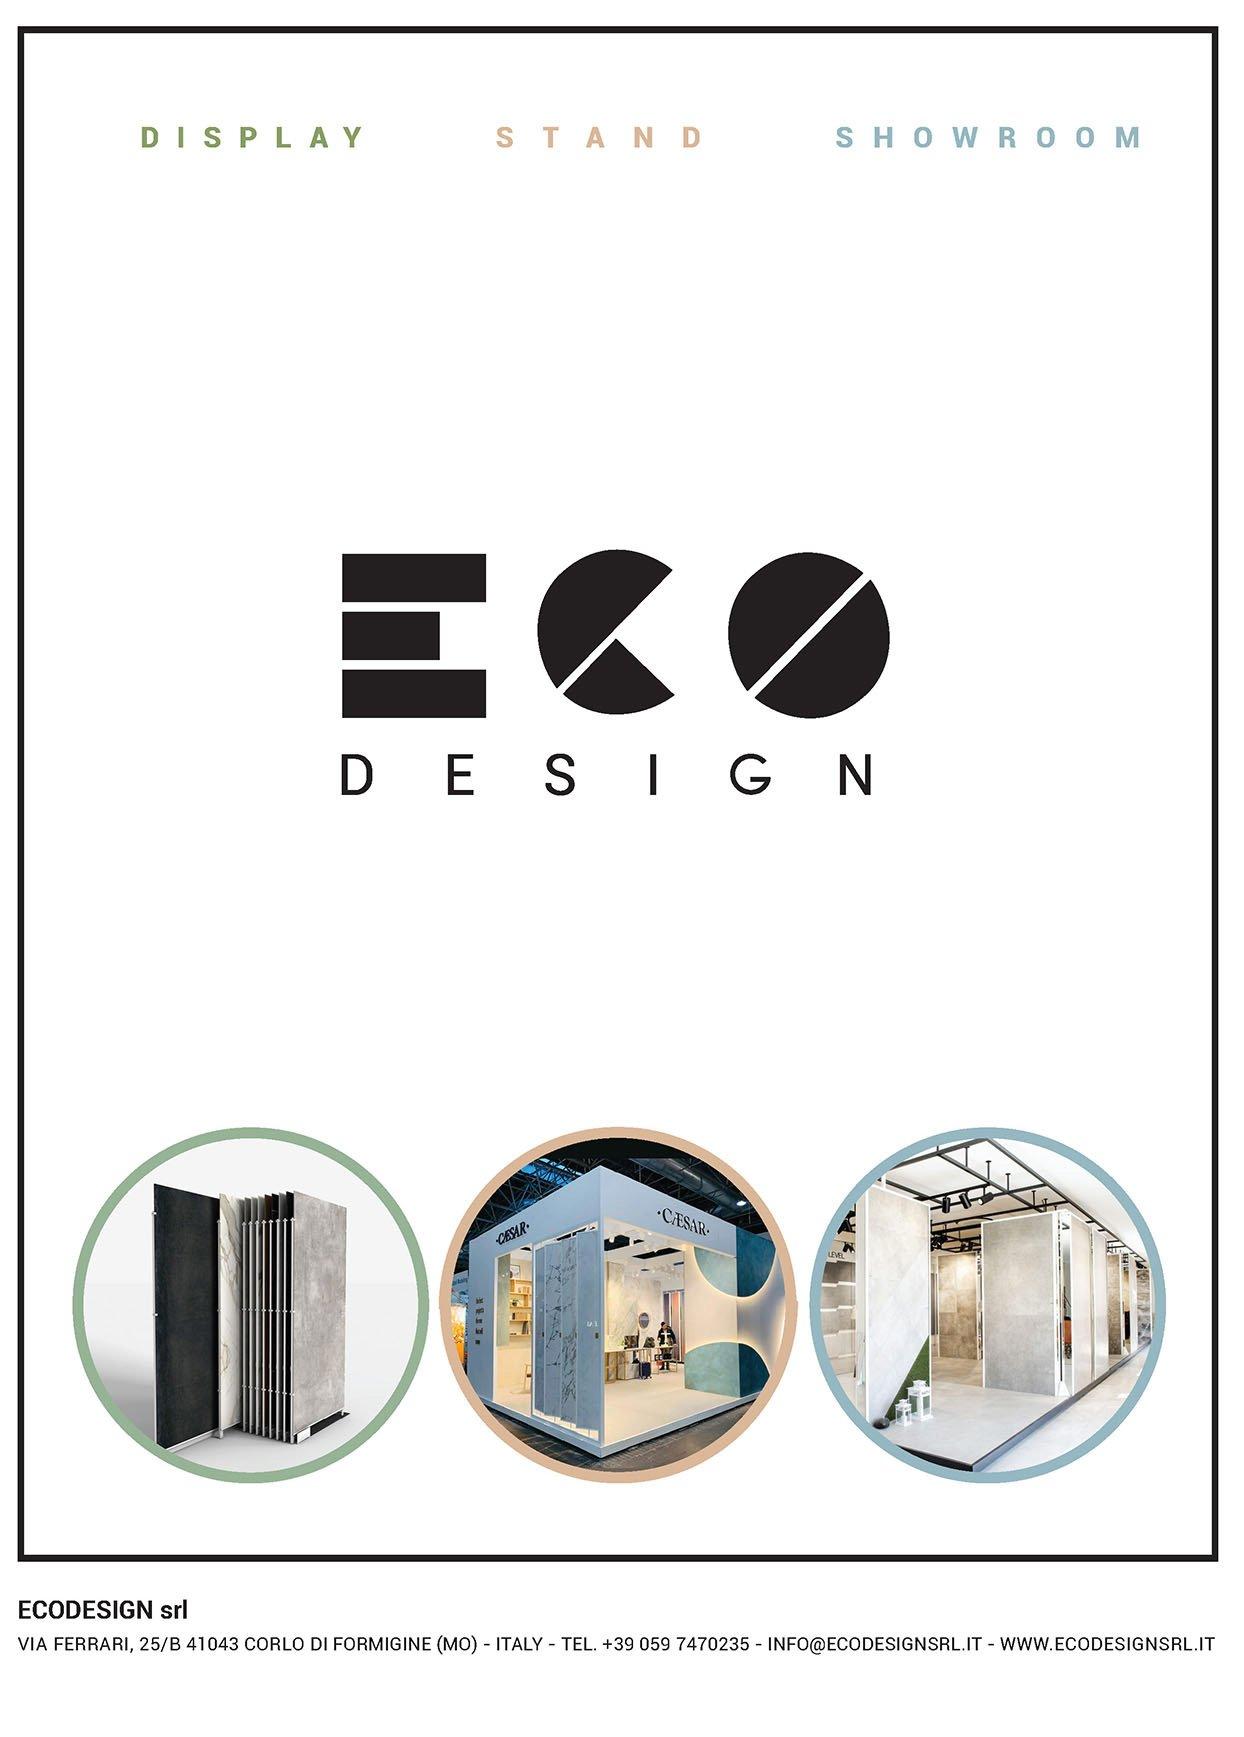 advertising ecodesign coverings 2019